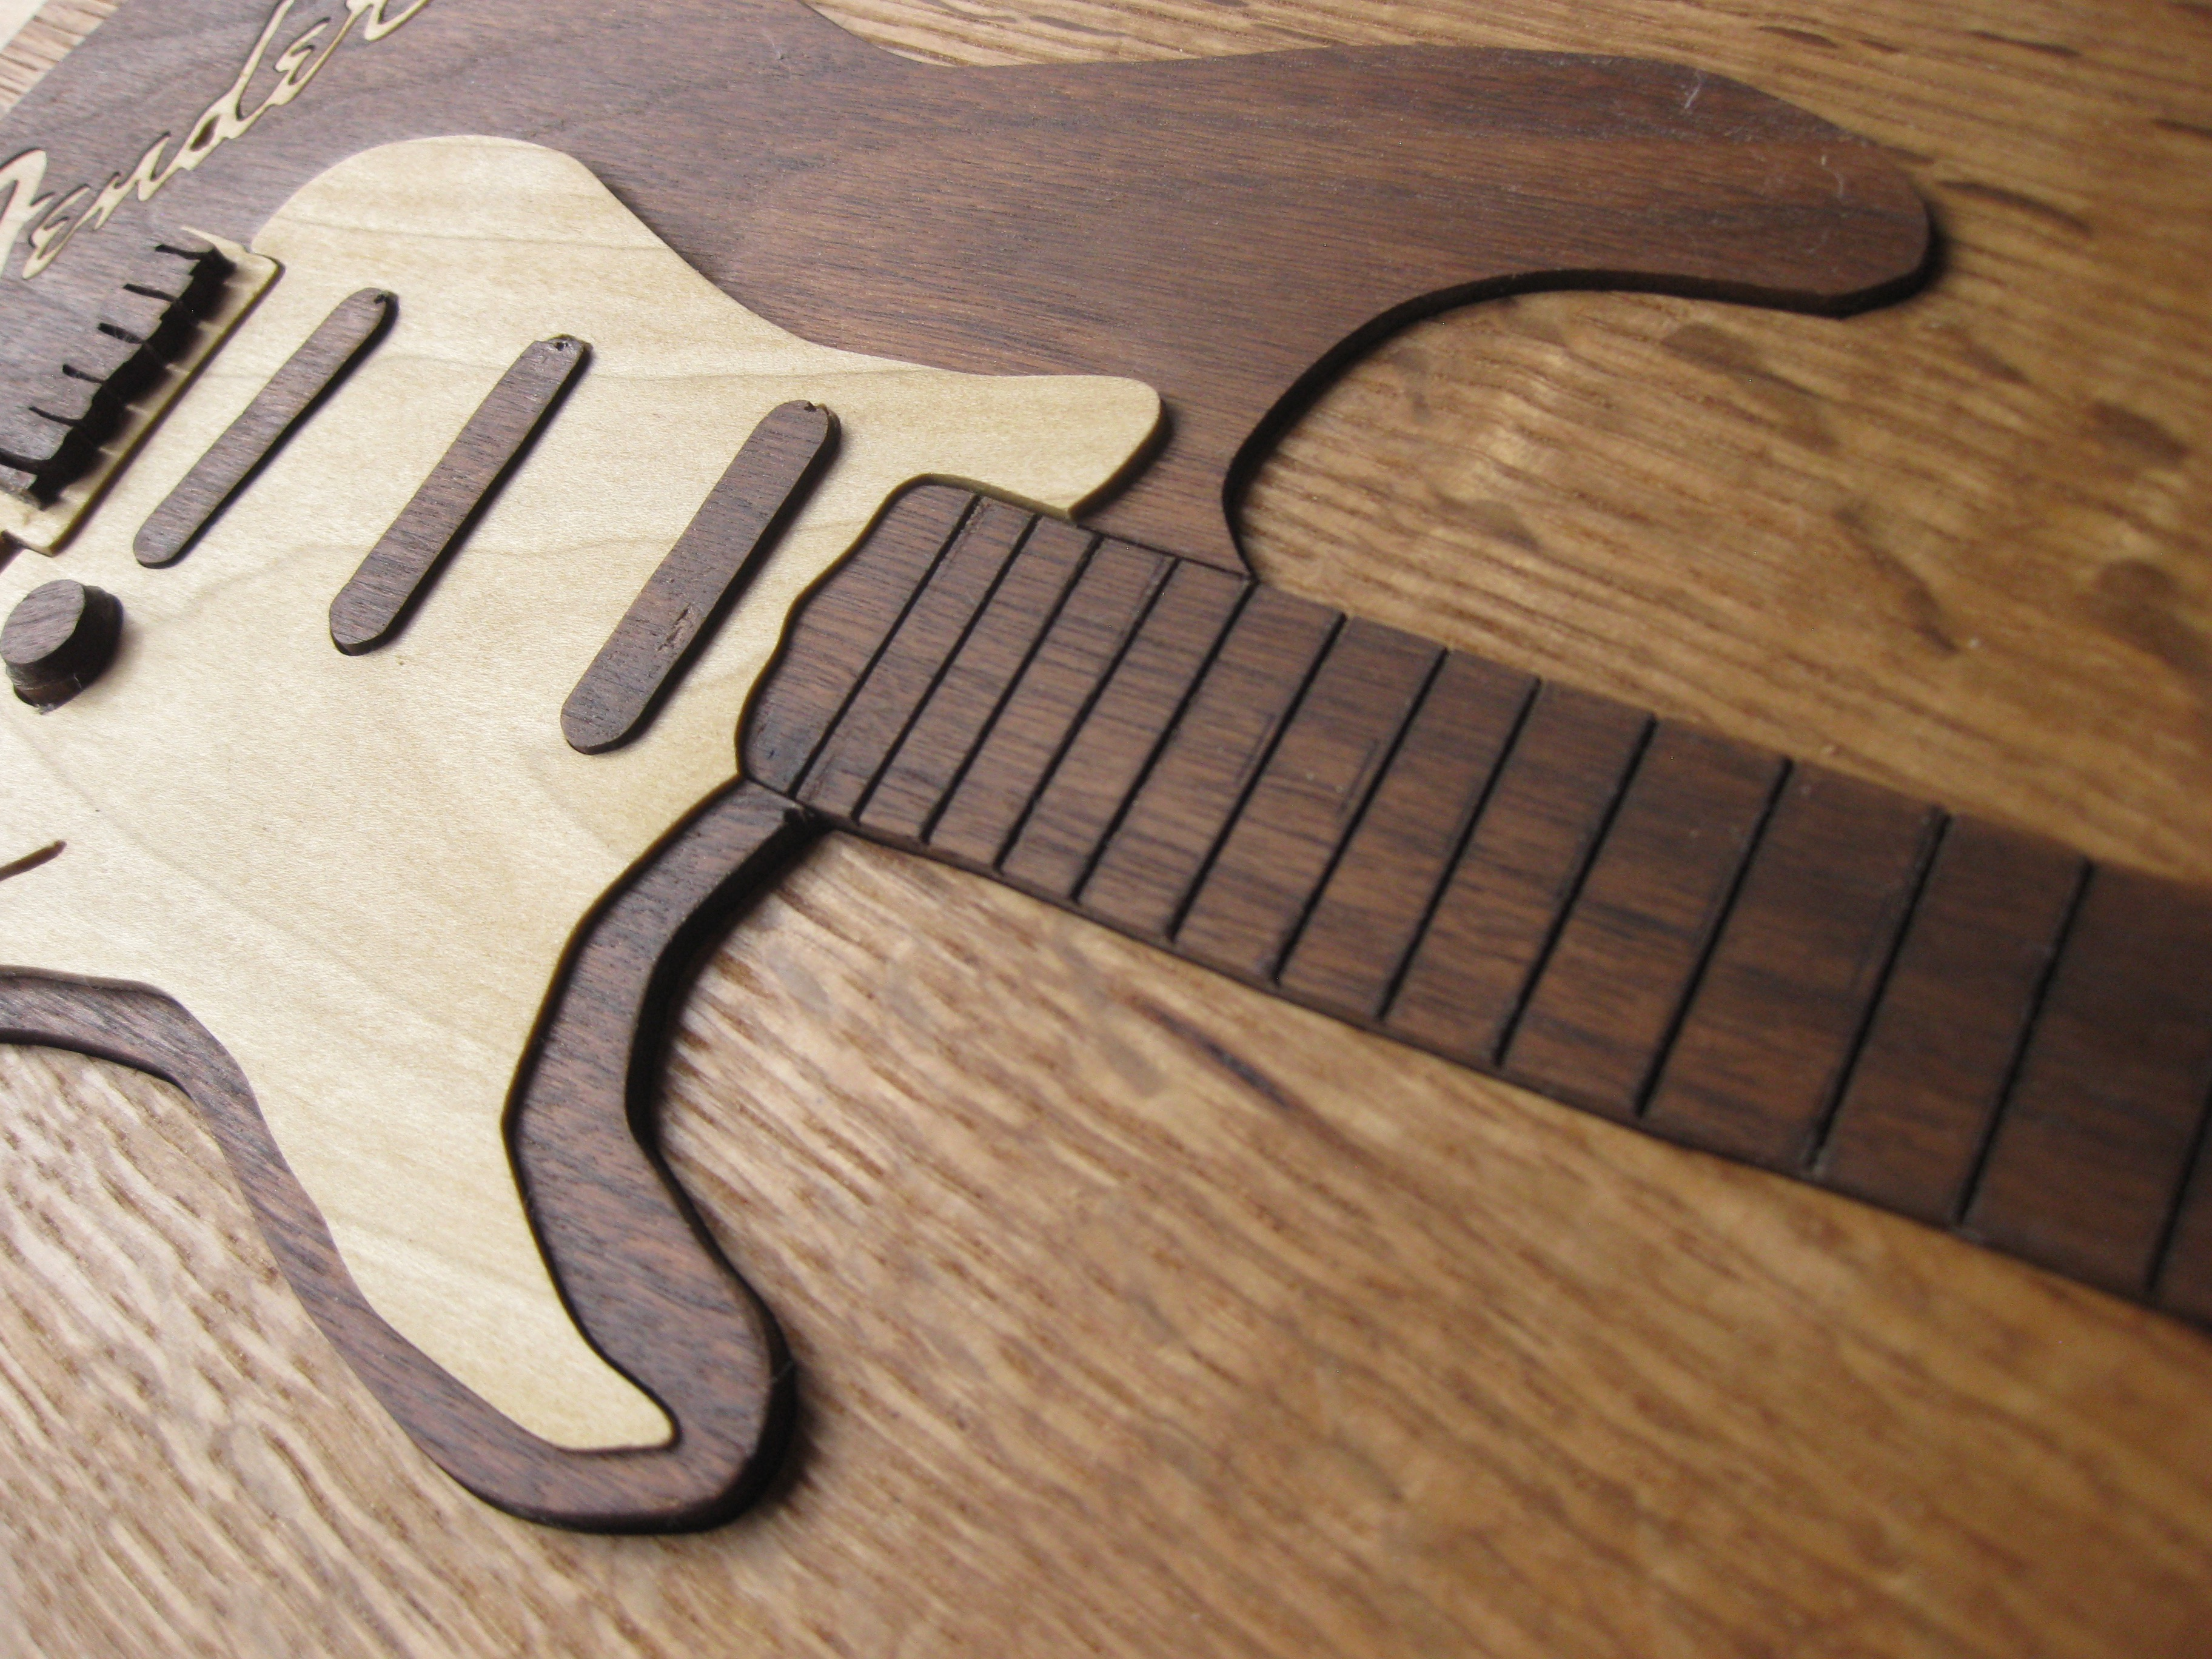 Top Slant View of Fender Guitar Art Puzzle